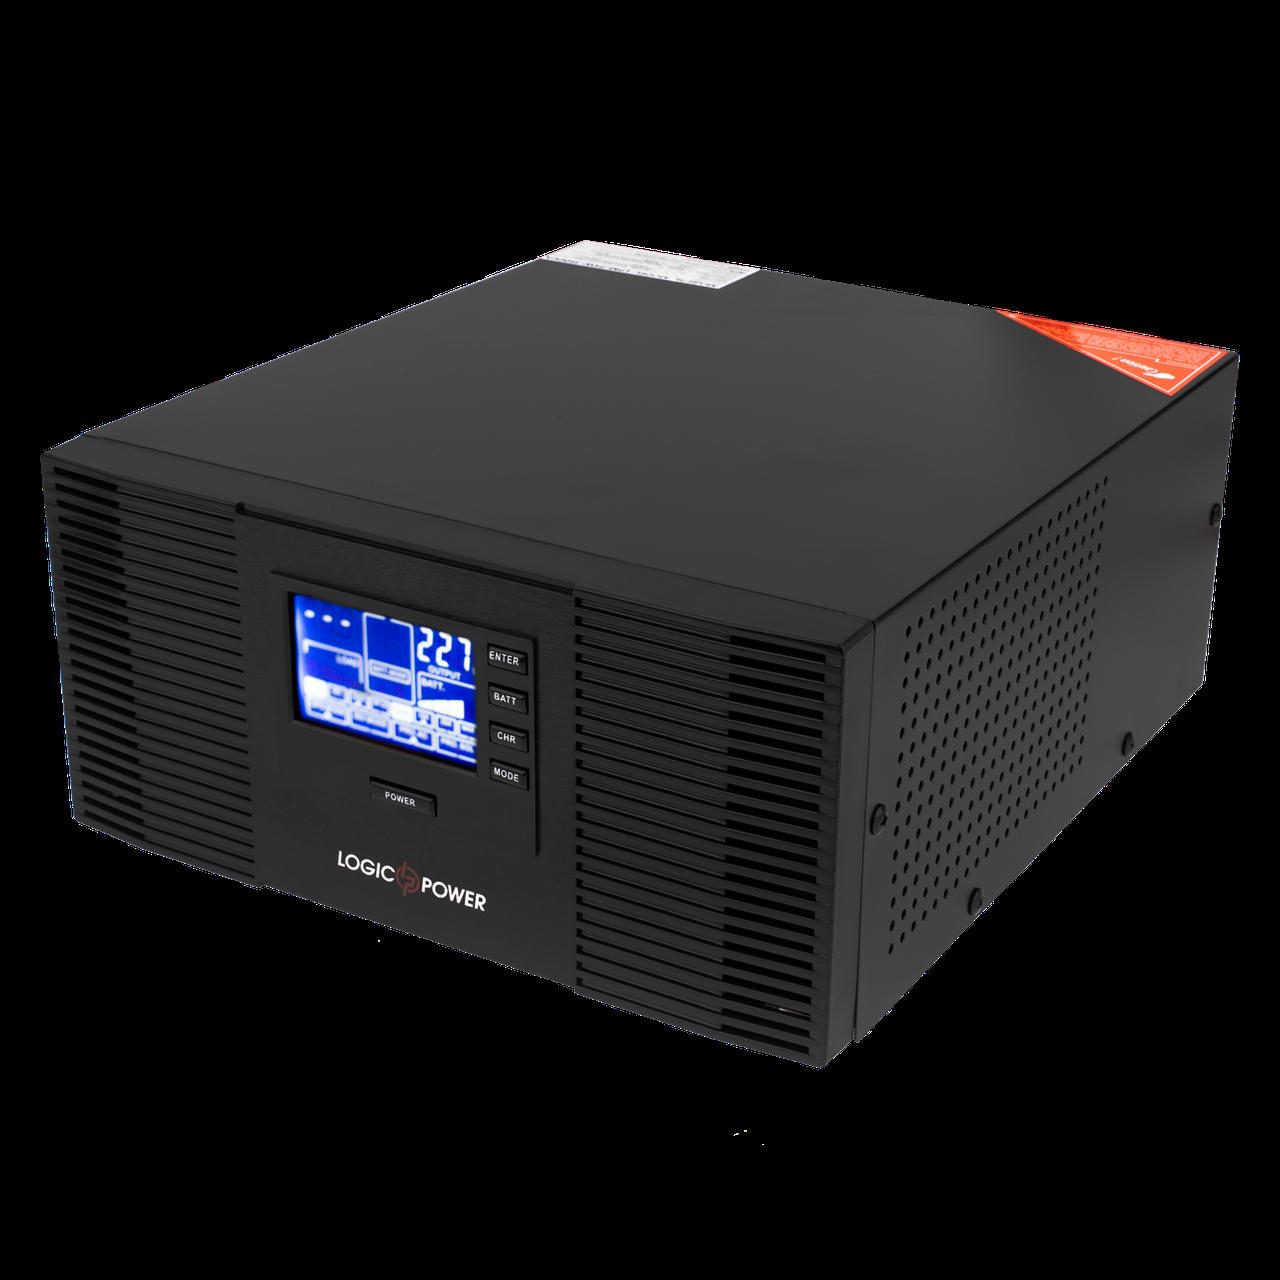 Logicpower LPM-PSW-1500VA (1050W) 12V